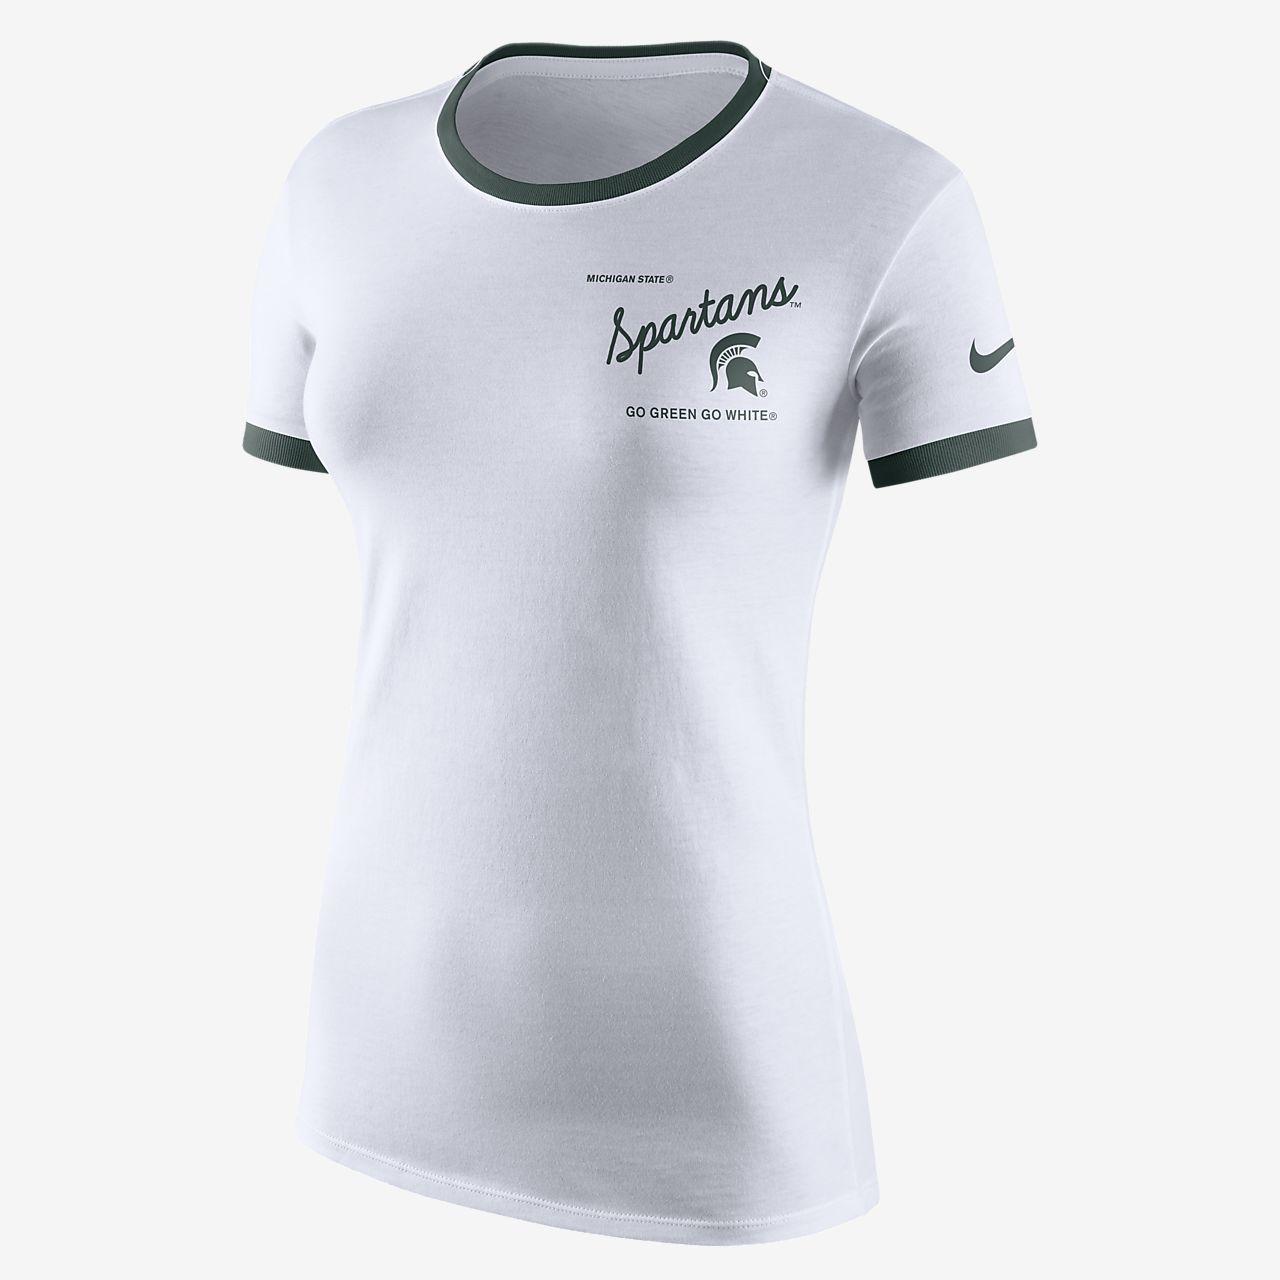 Nike College (Michigan State) Women's Tri-Blend T-Shirt